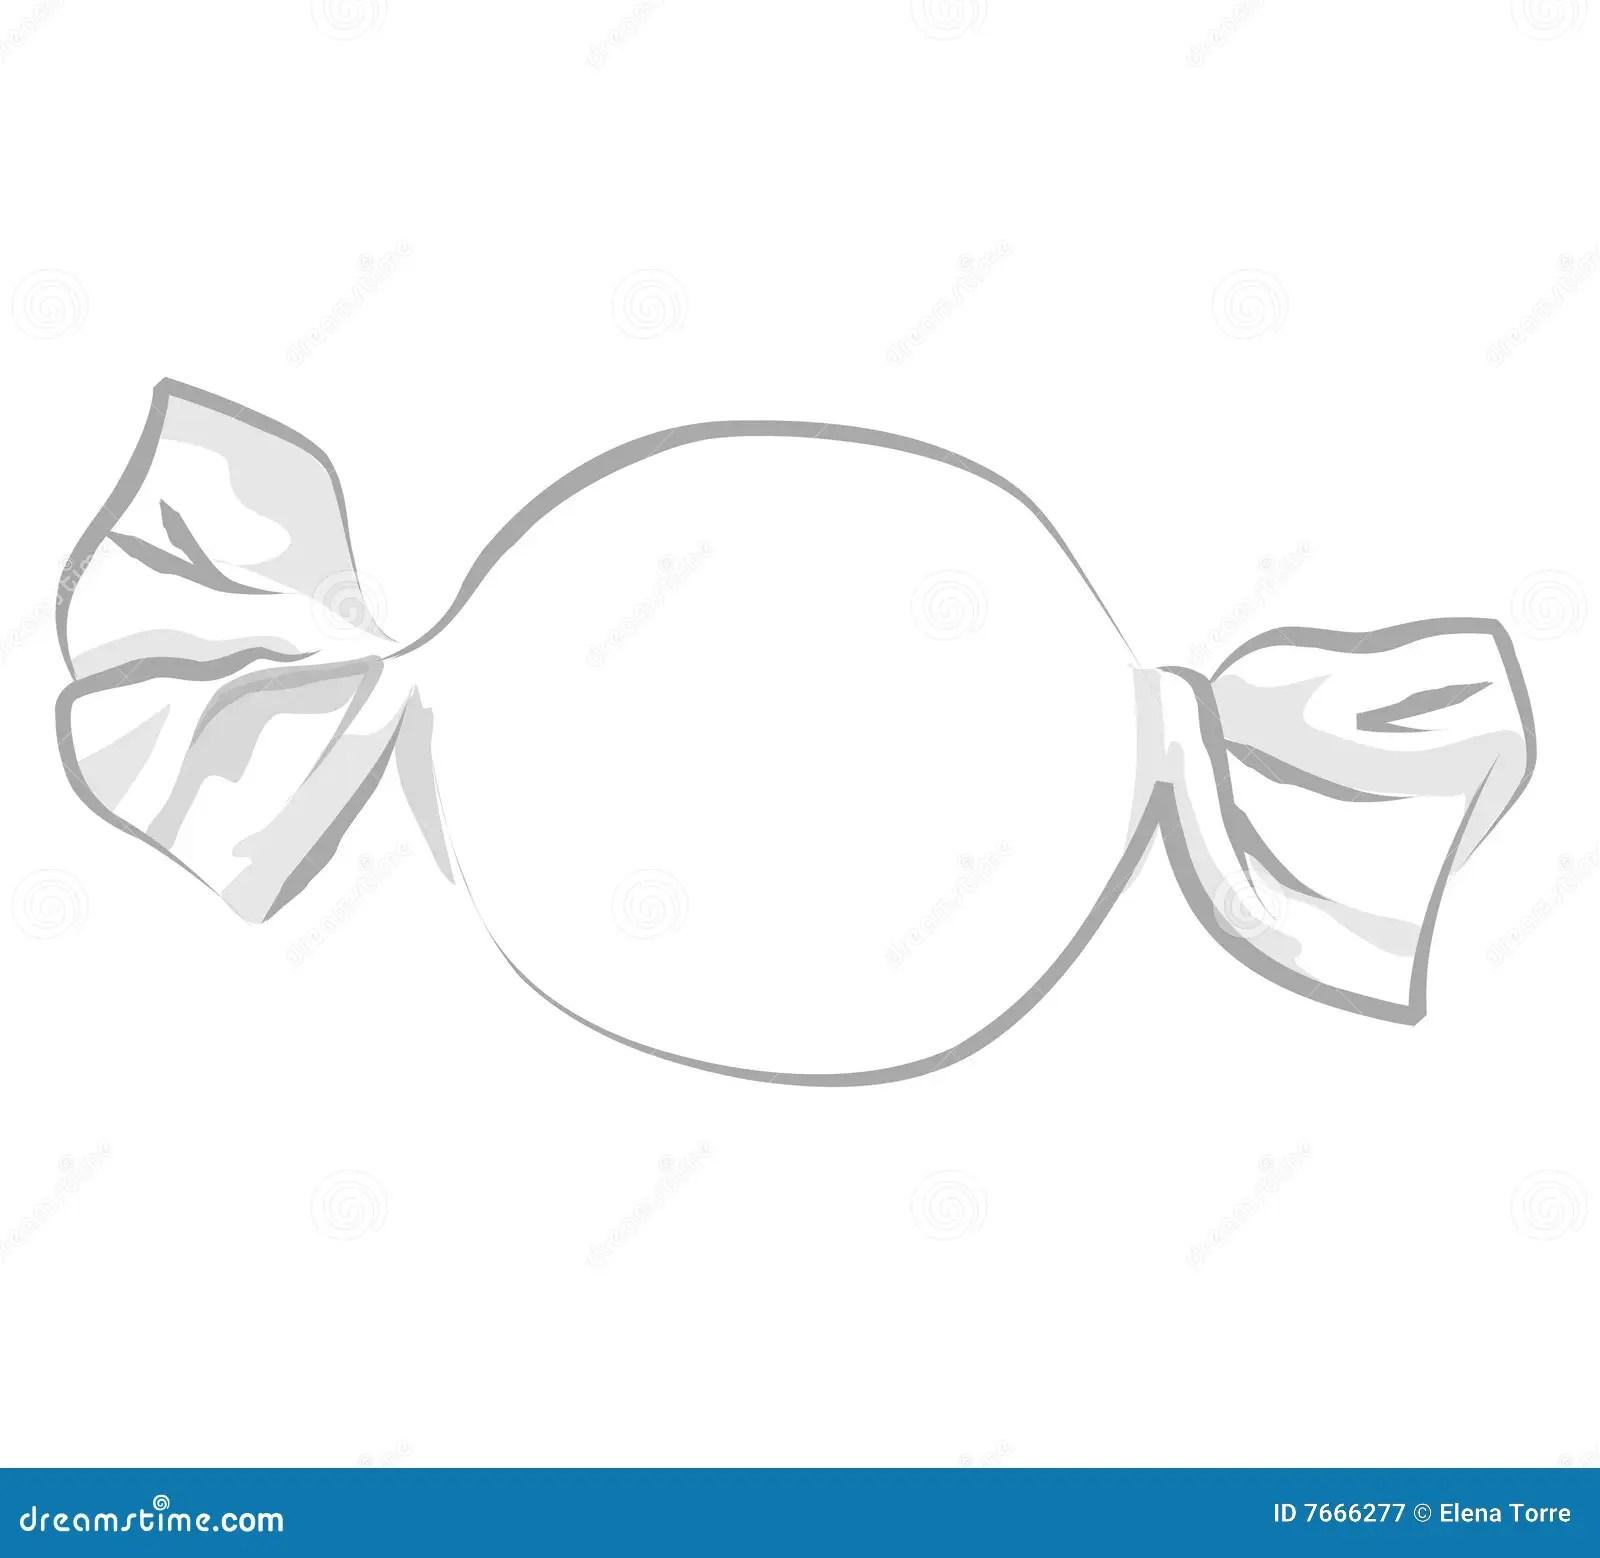 Junk Clip Art Black And White